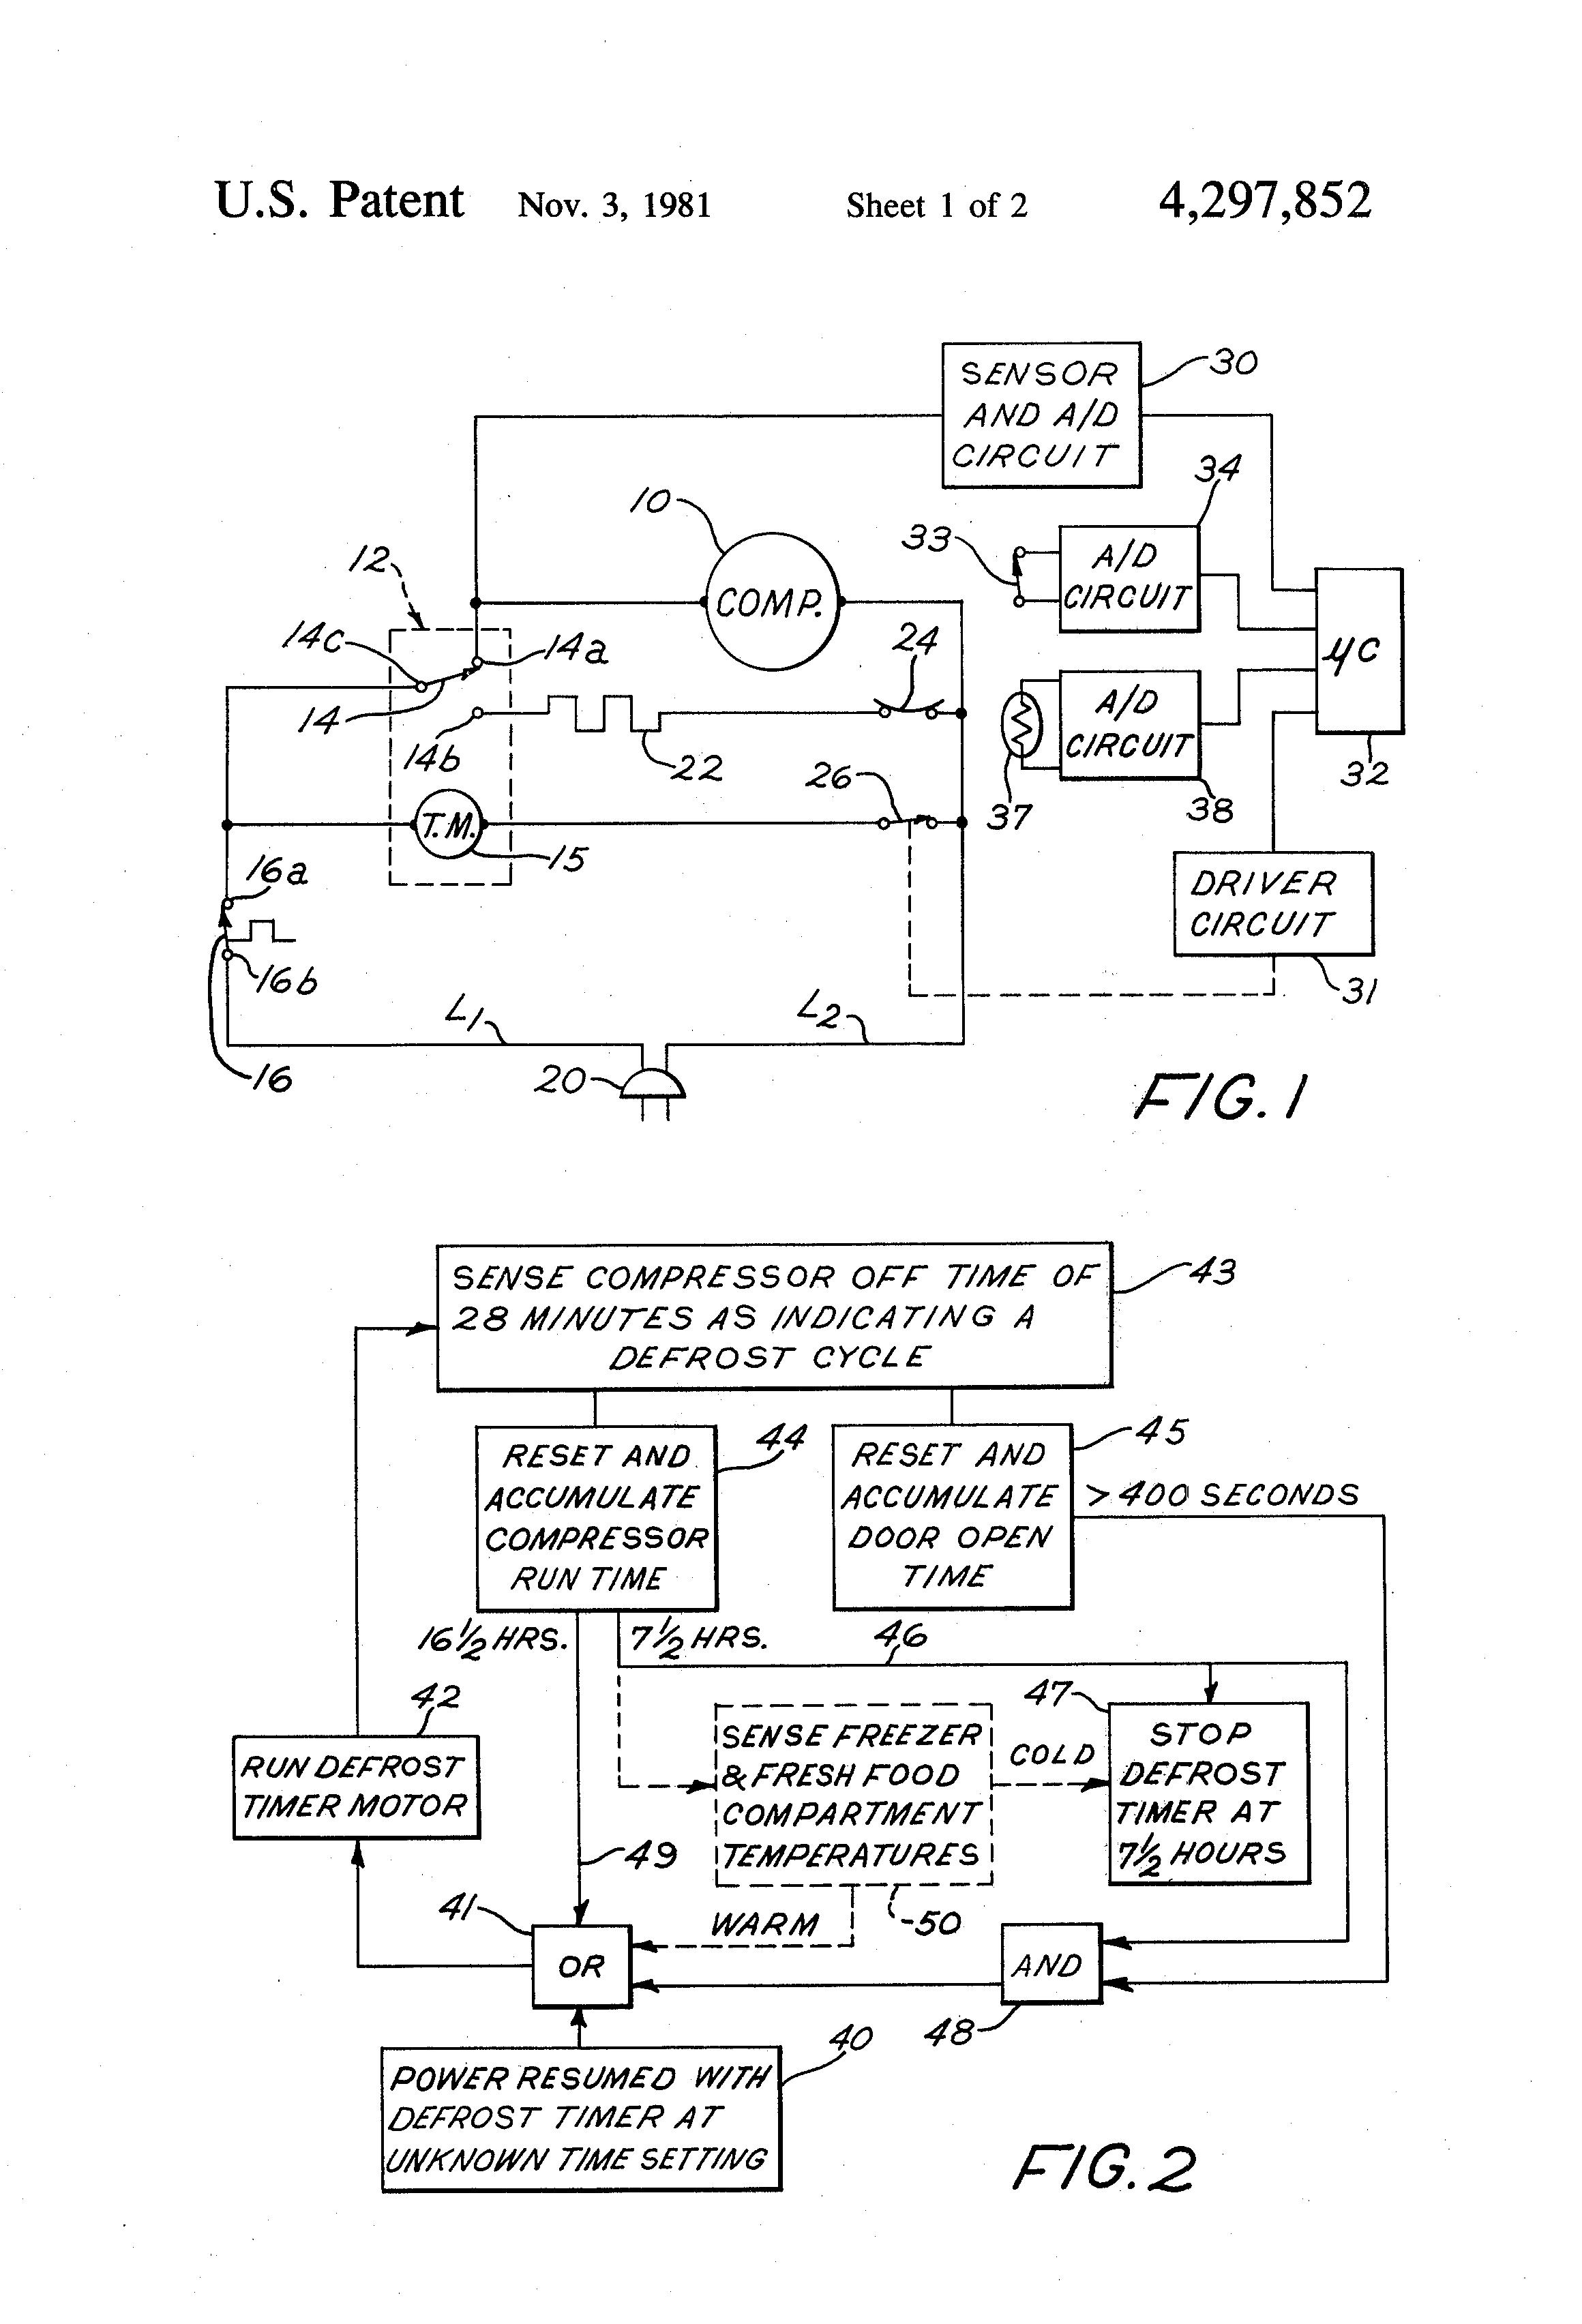 heatcraft evaporator wiring diagram all wiring diagram True Freezer Wiring-Diagram